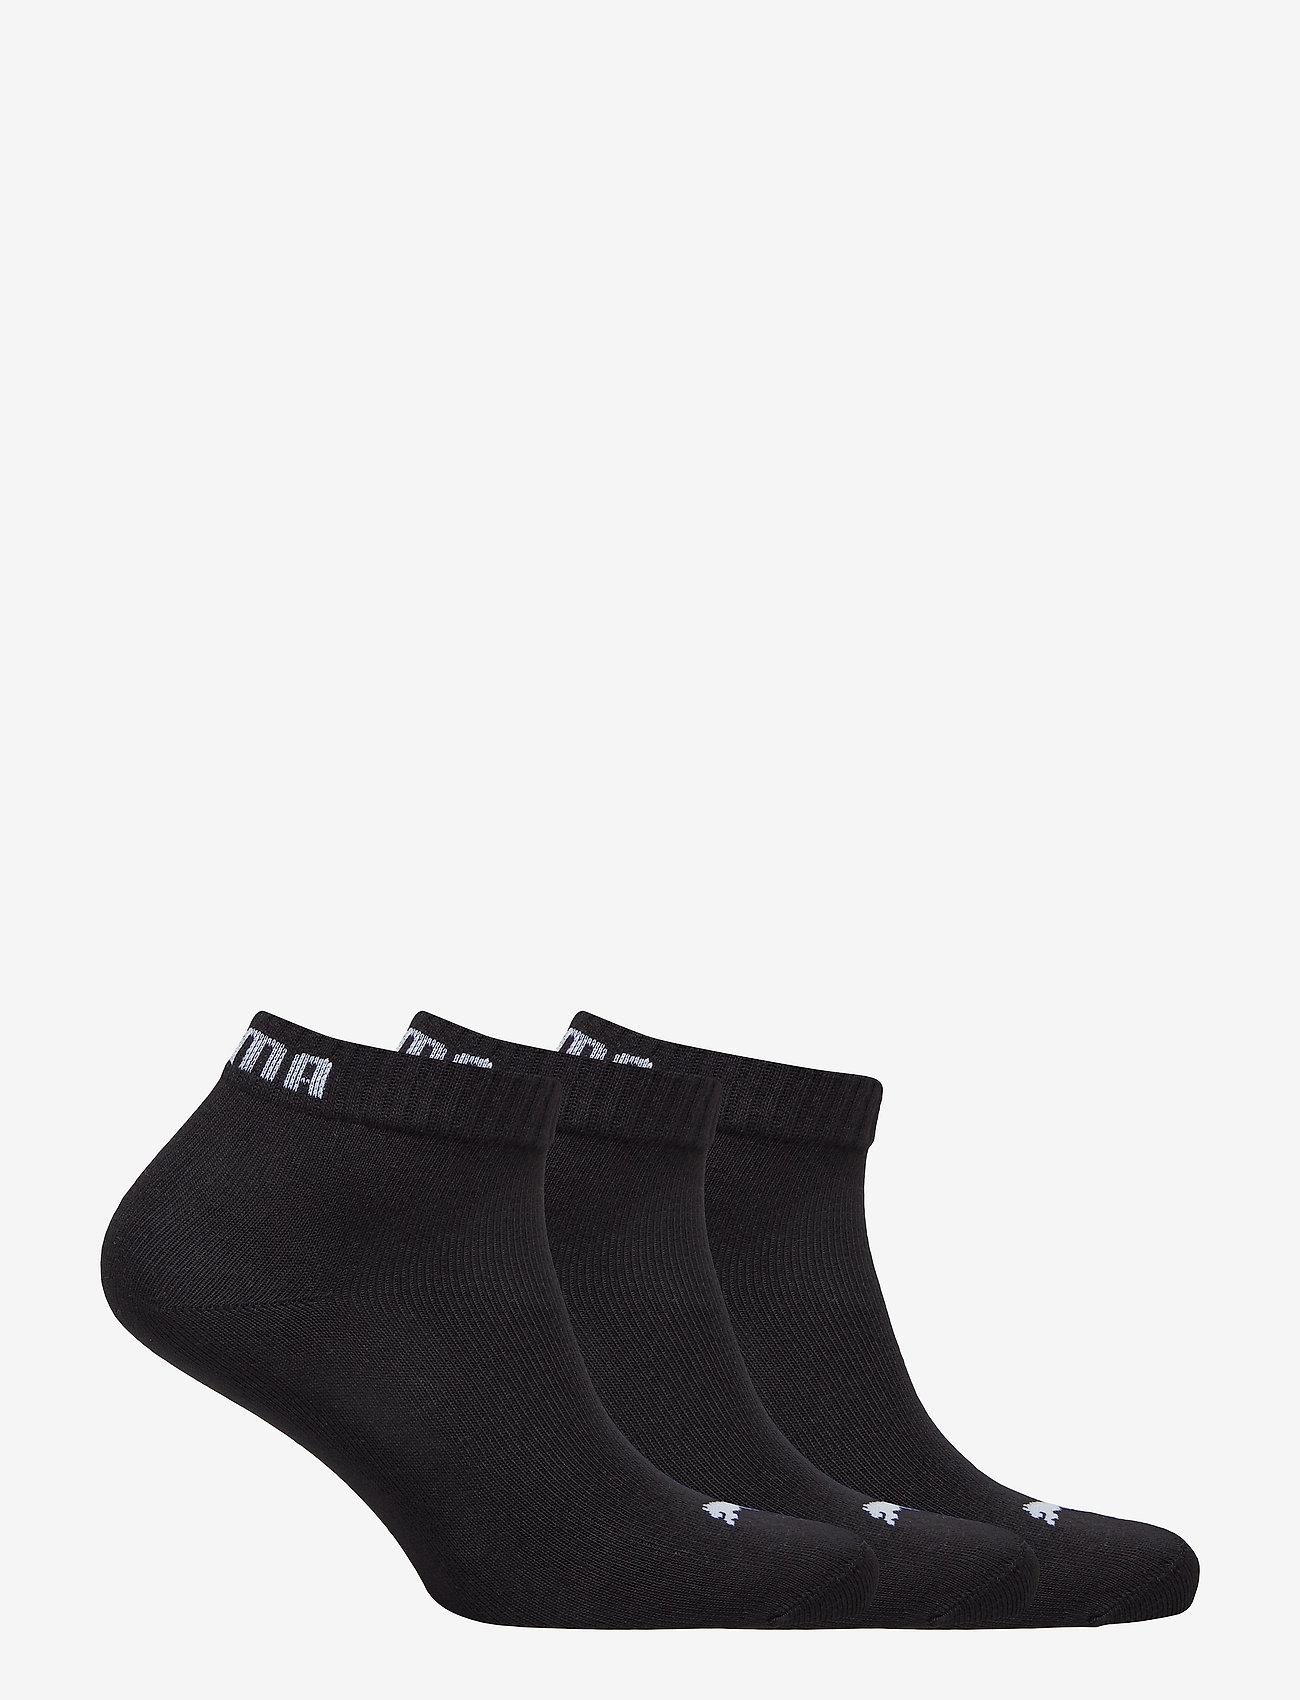 PUMA Puma Unisex Quarter Plain 3p - Ankle socks   Boozt.com